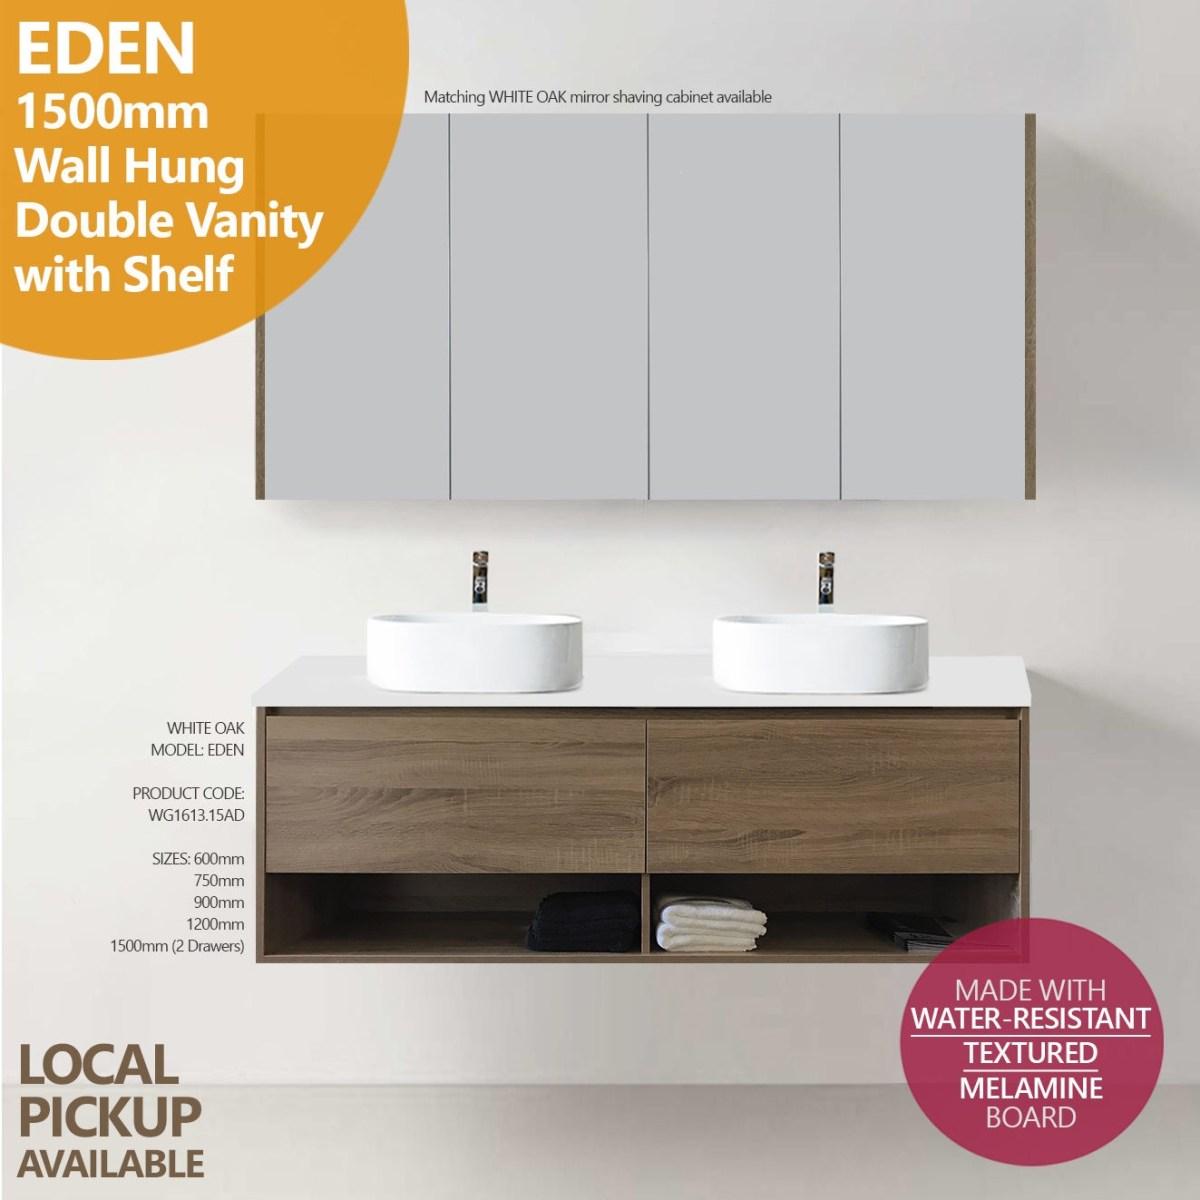 Eden 1500mm White Oak Timber Wood Grain Wall Hung Double